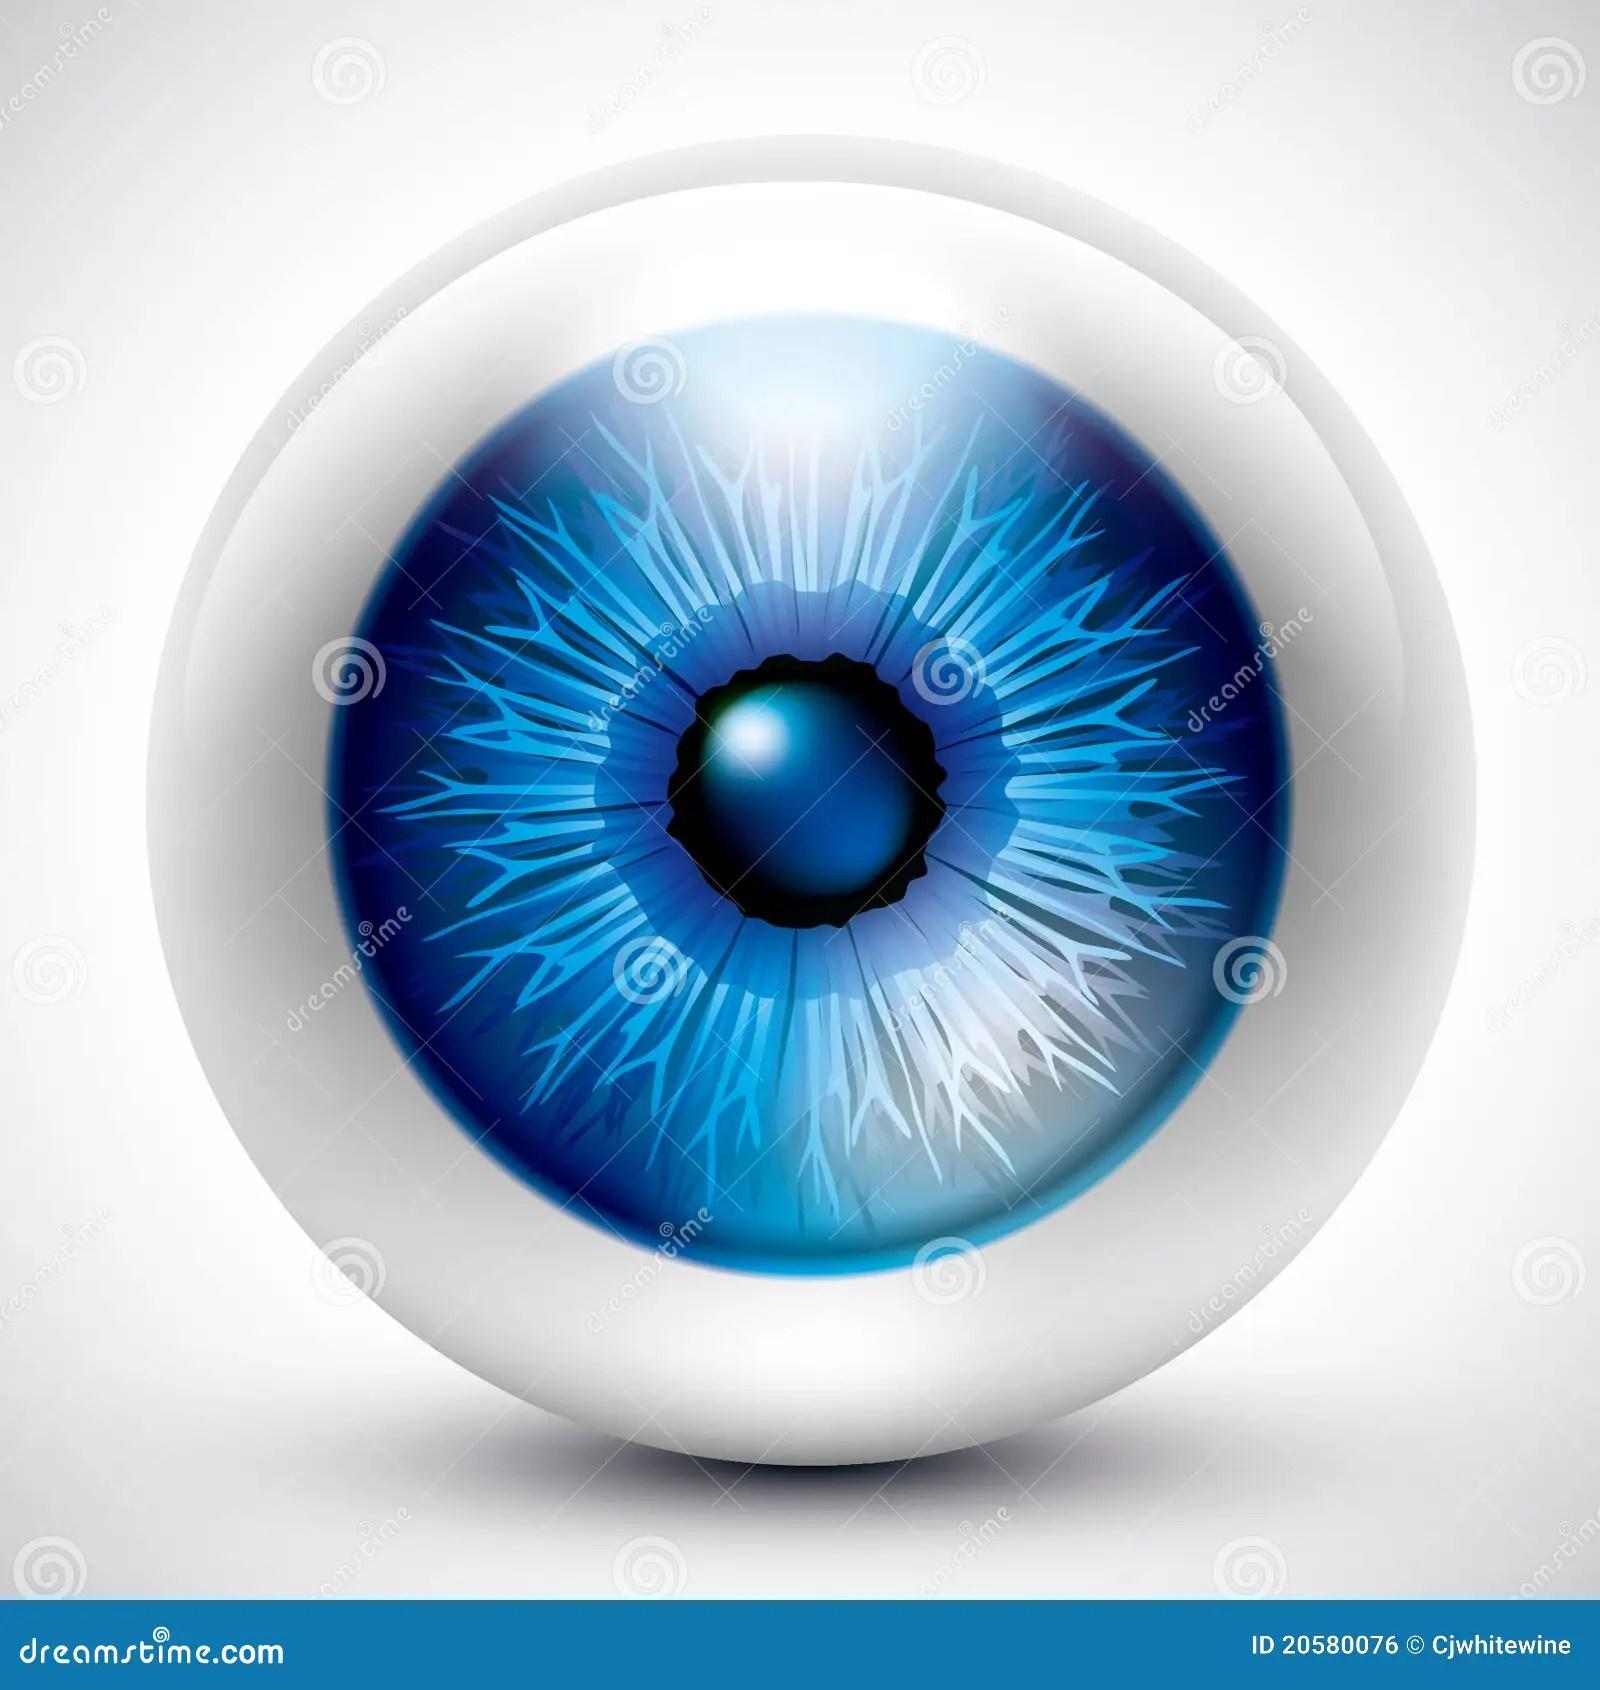 https://i2.wp.com/thumbs.dreamstime.com/z/eyeball-20580076.jpg